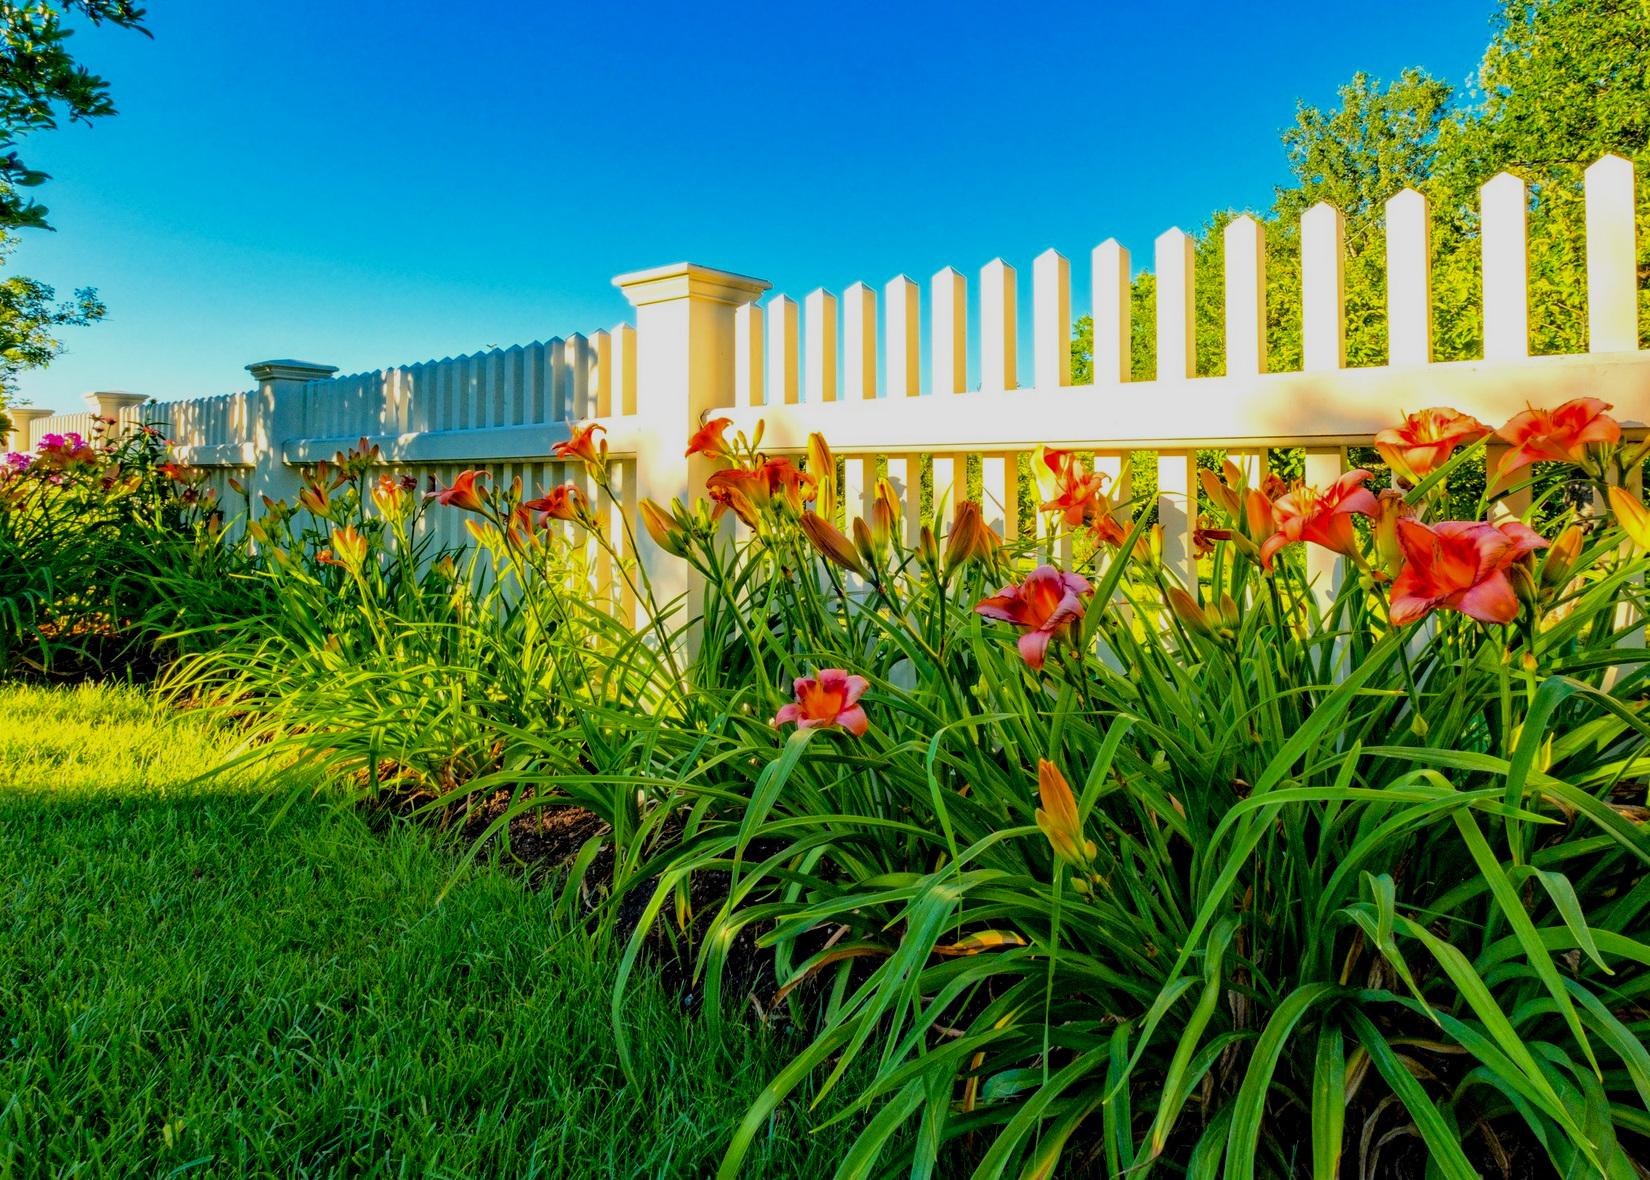 Fine Gardening Internship - at Pellettieri Associates, Inc.